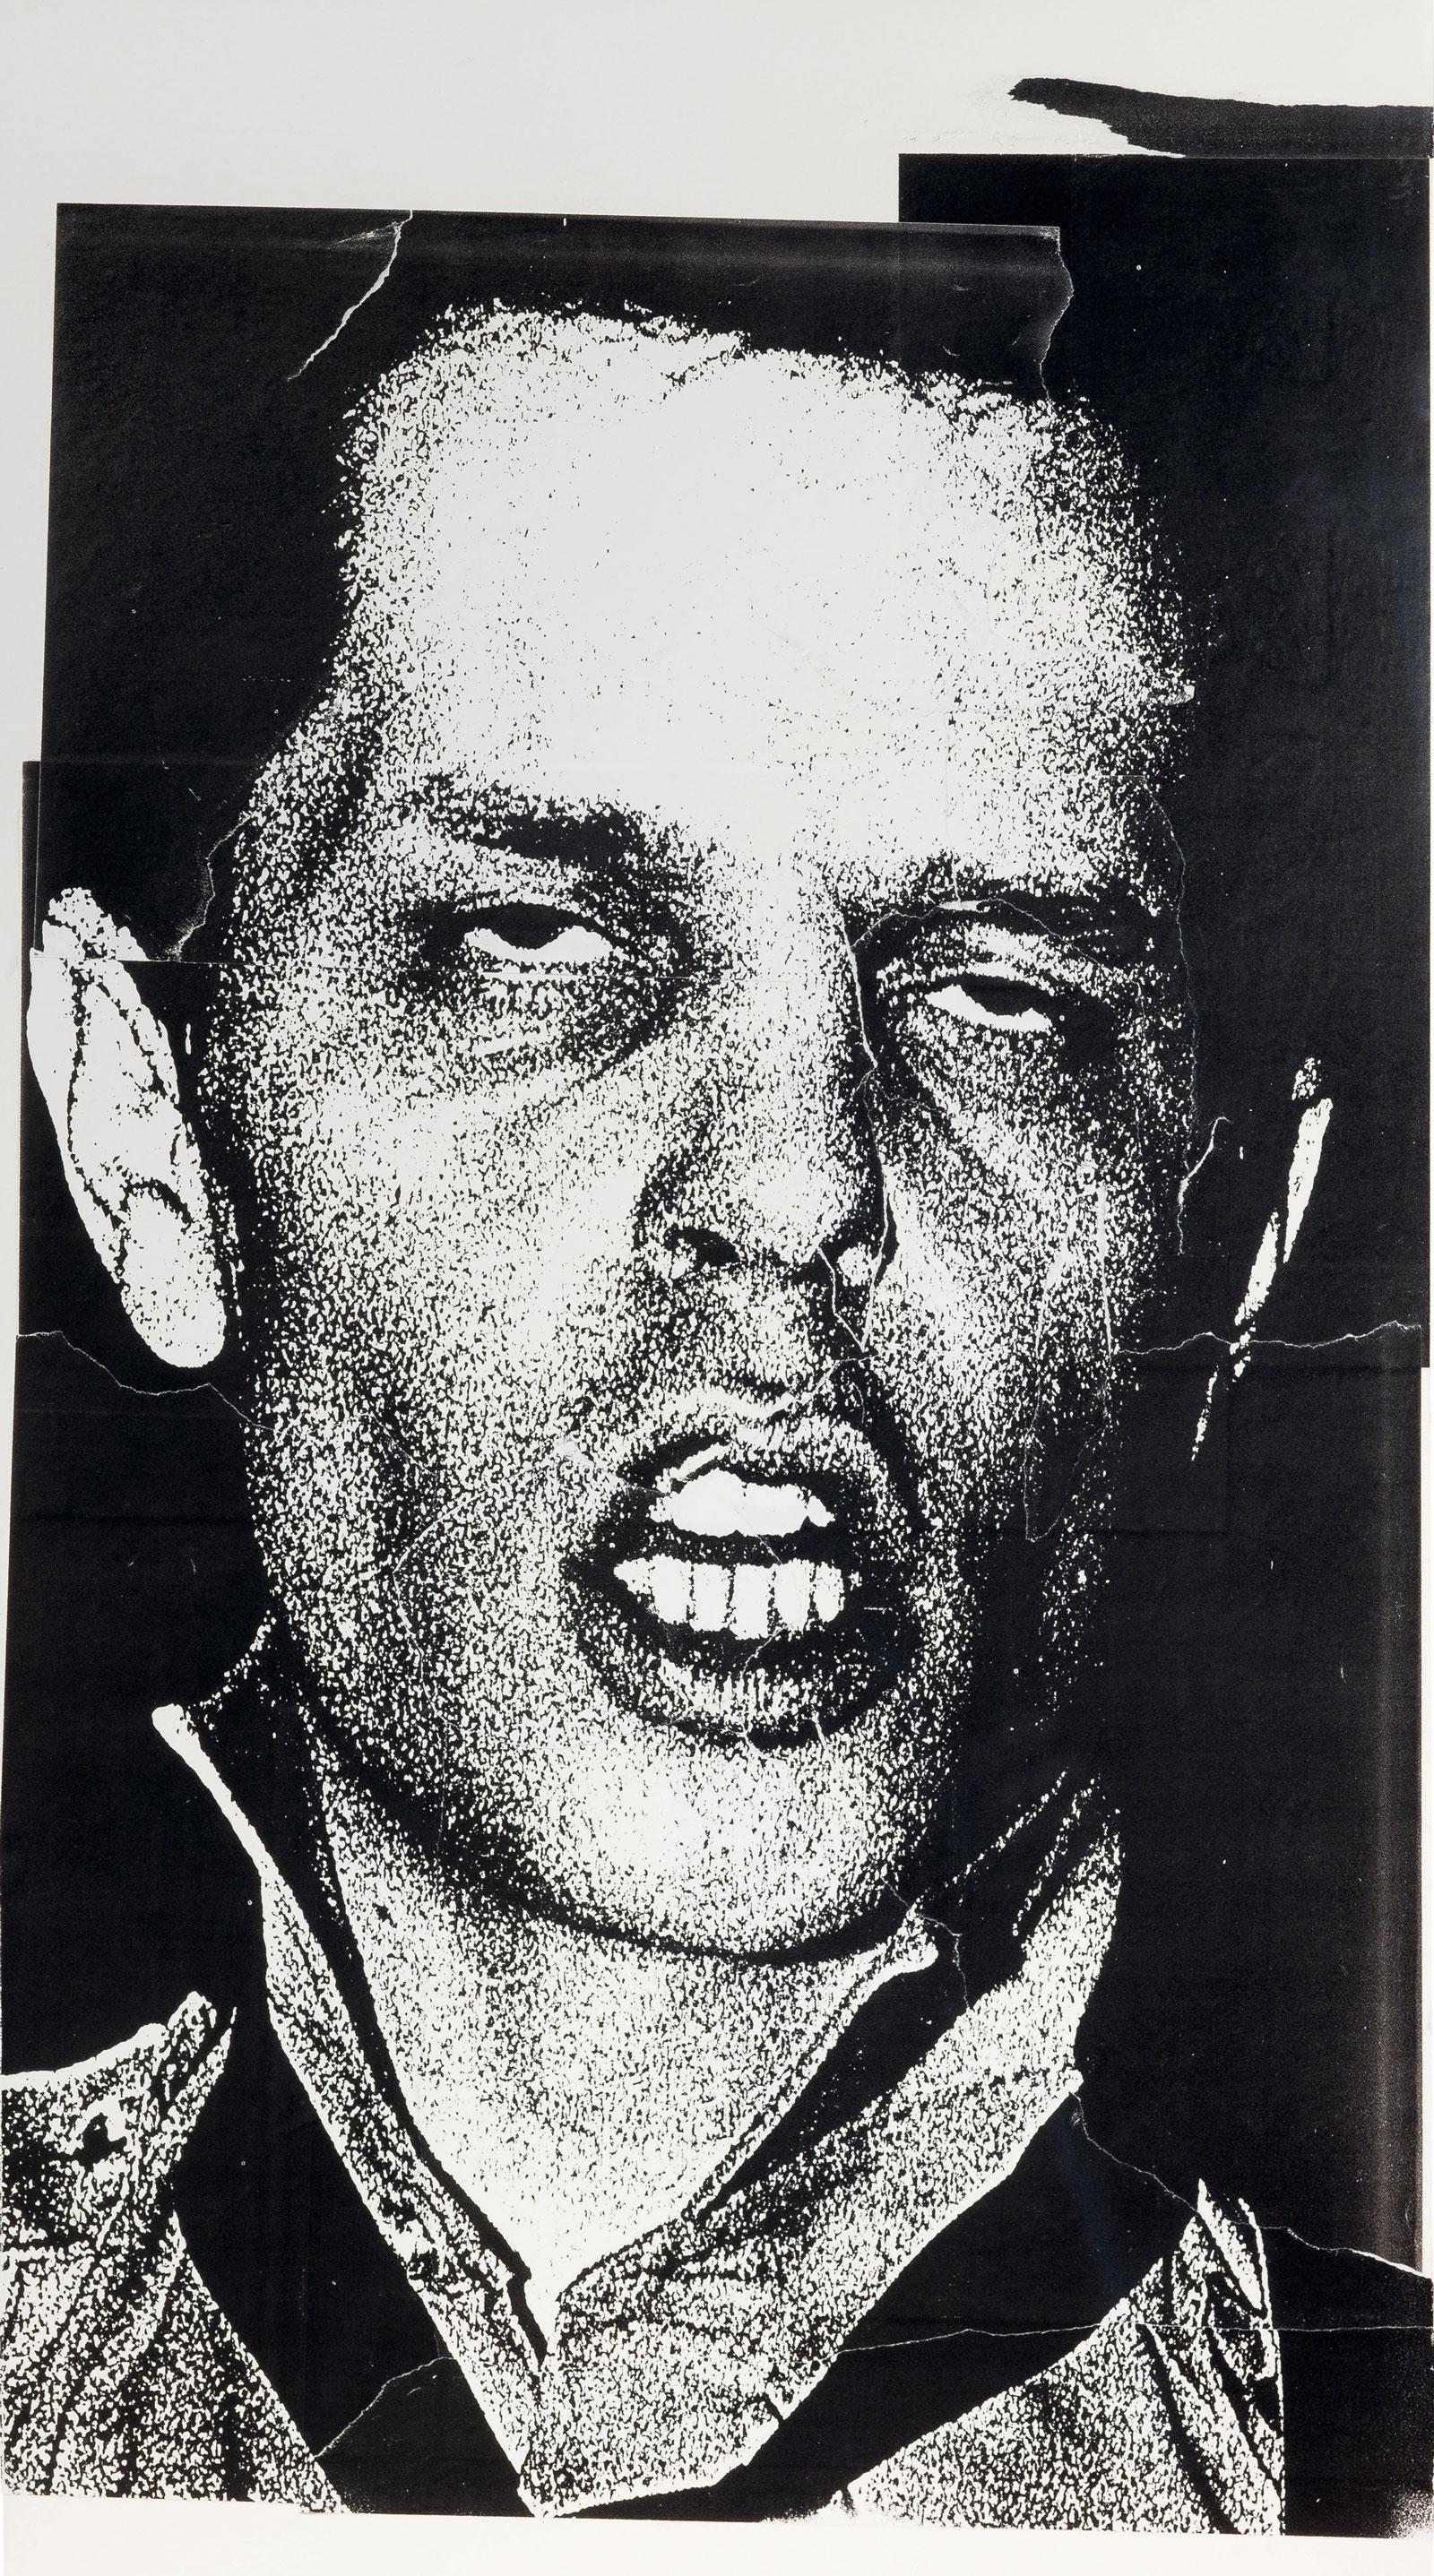 Bruce Conner: Frankie Fix, 1977